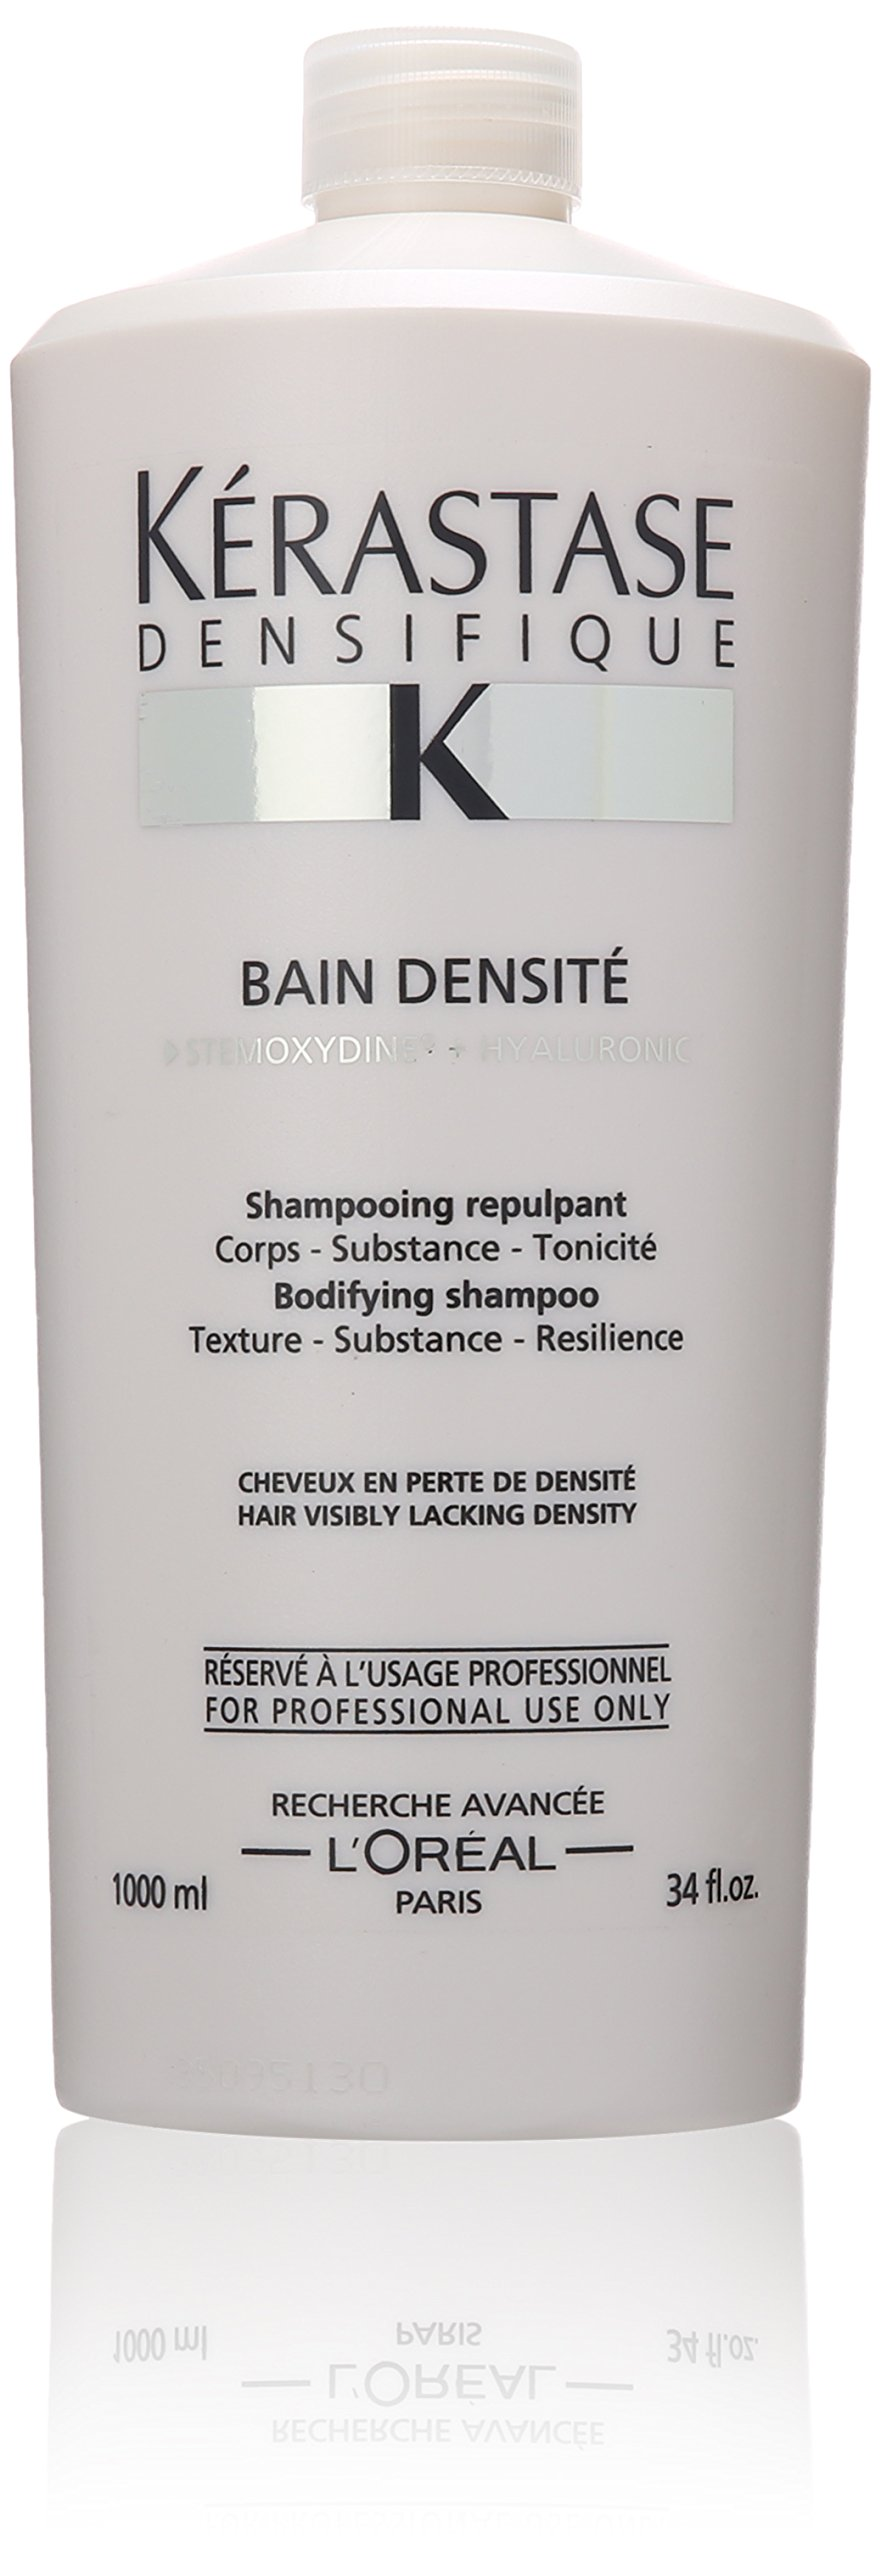 Kerastase Densifique Densite Bodifying Shampoo